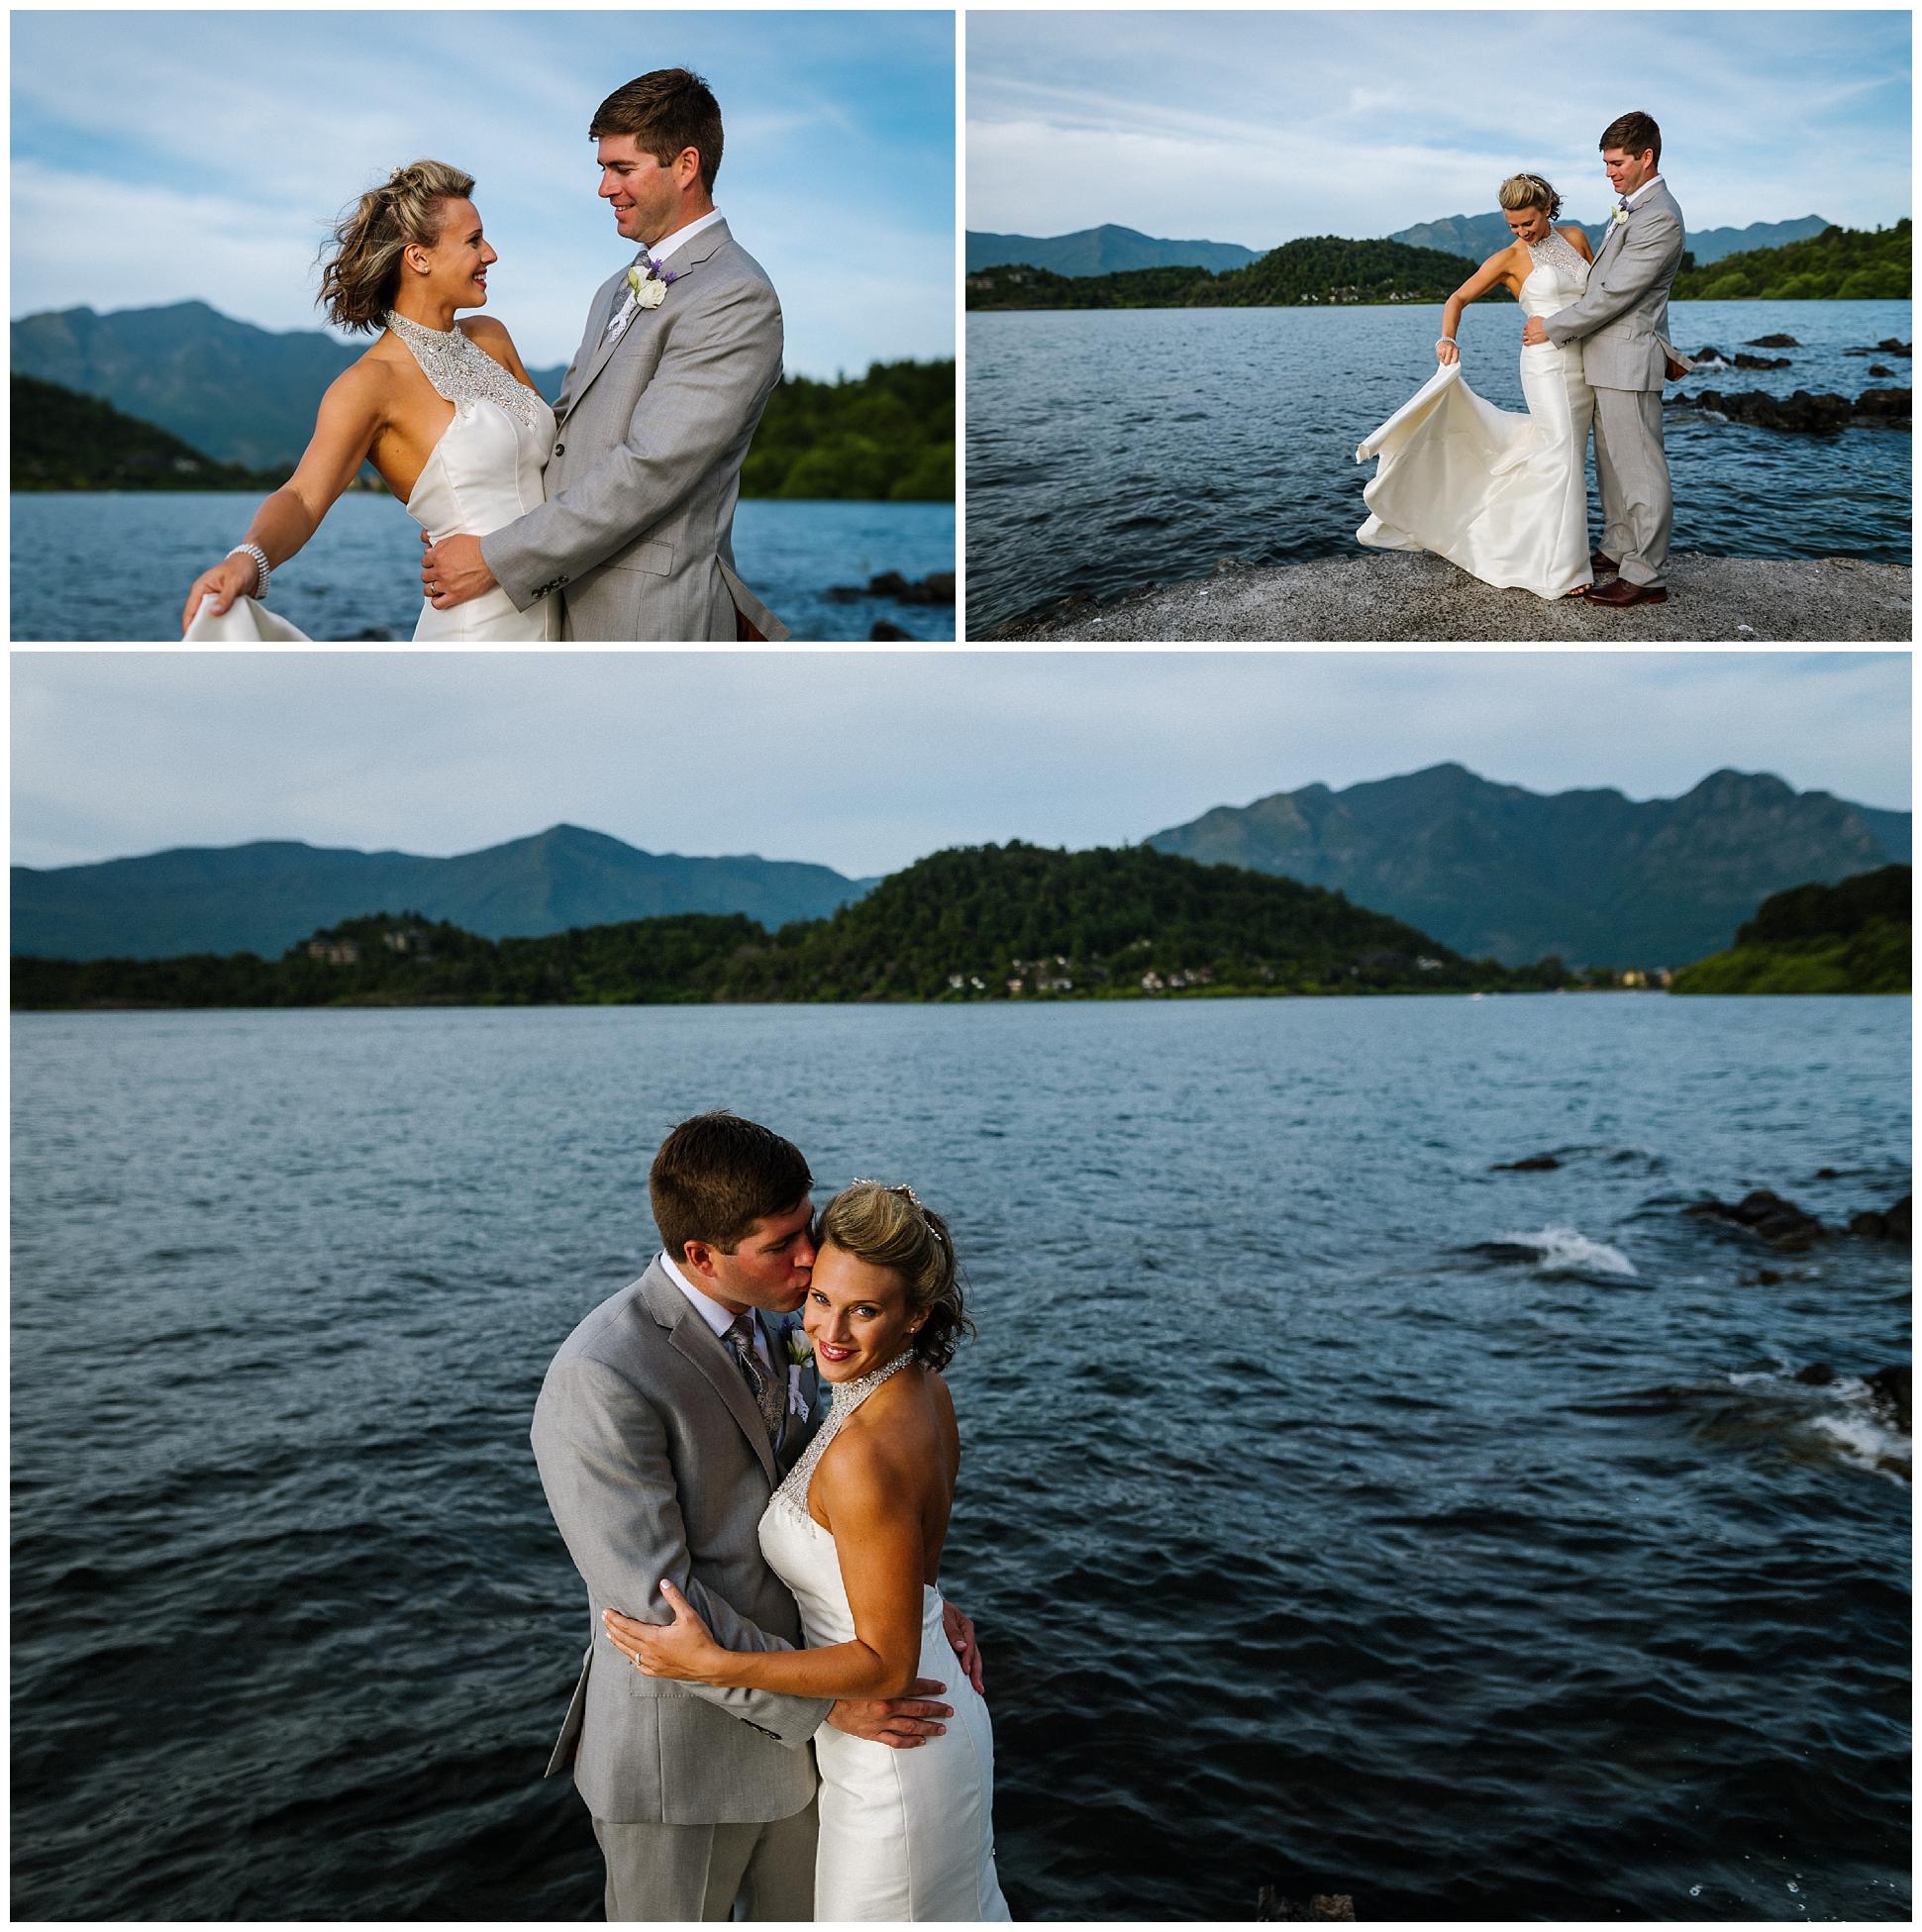 Cheilean-destination-adventure-wedding-florida-patagonia-pucon-santa-cruz-vsco_0128.jpg